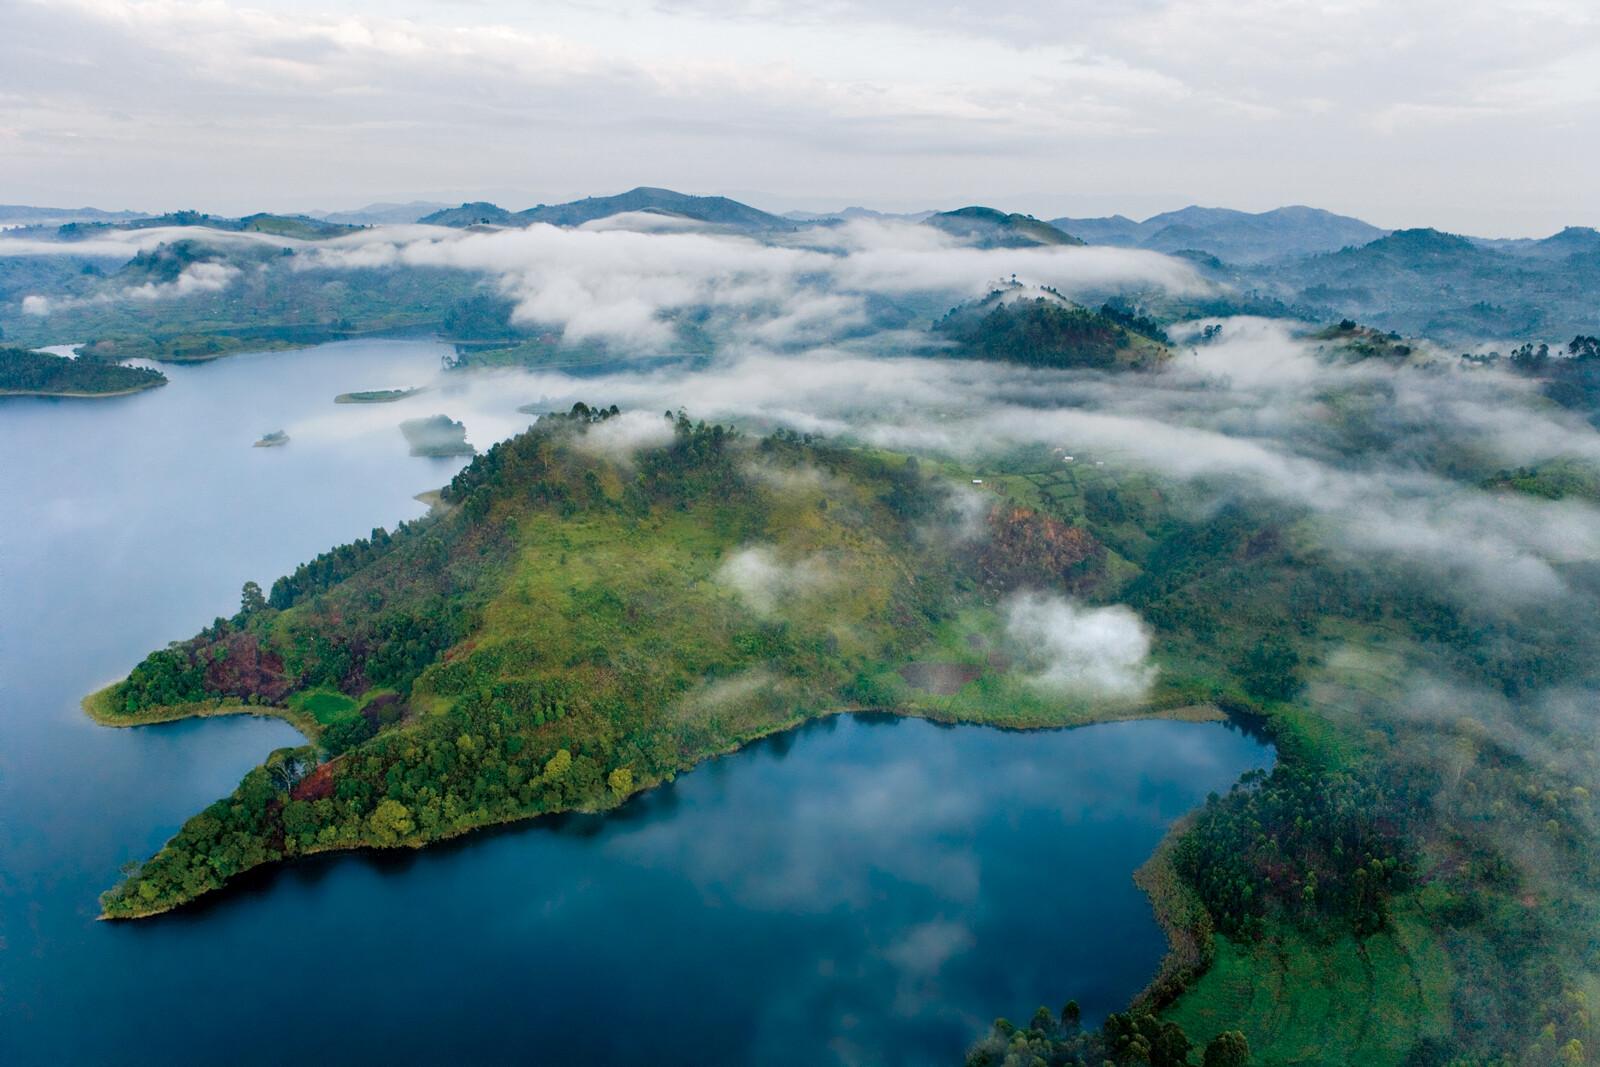 Lake Mutanda Kisoro, Uganda  - Michael Poliza